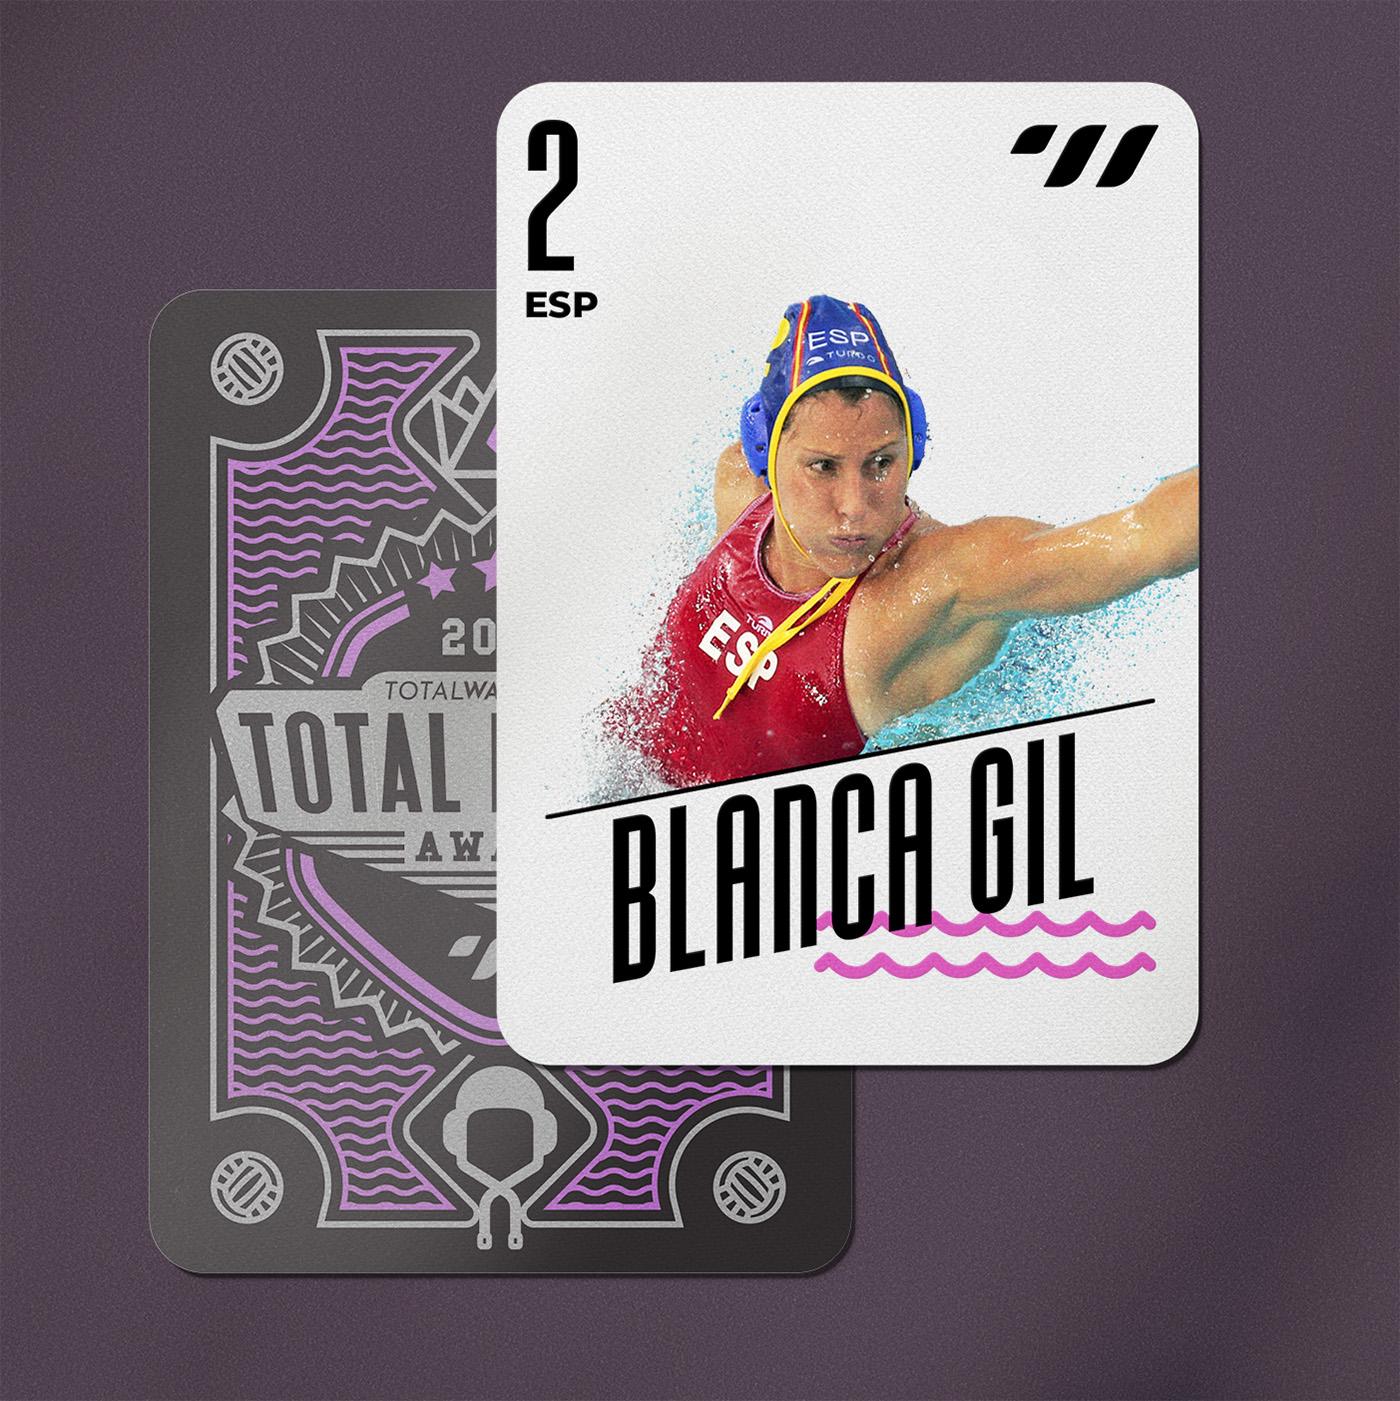 CENTER BACK - Blanca Gil (ESP)